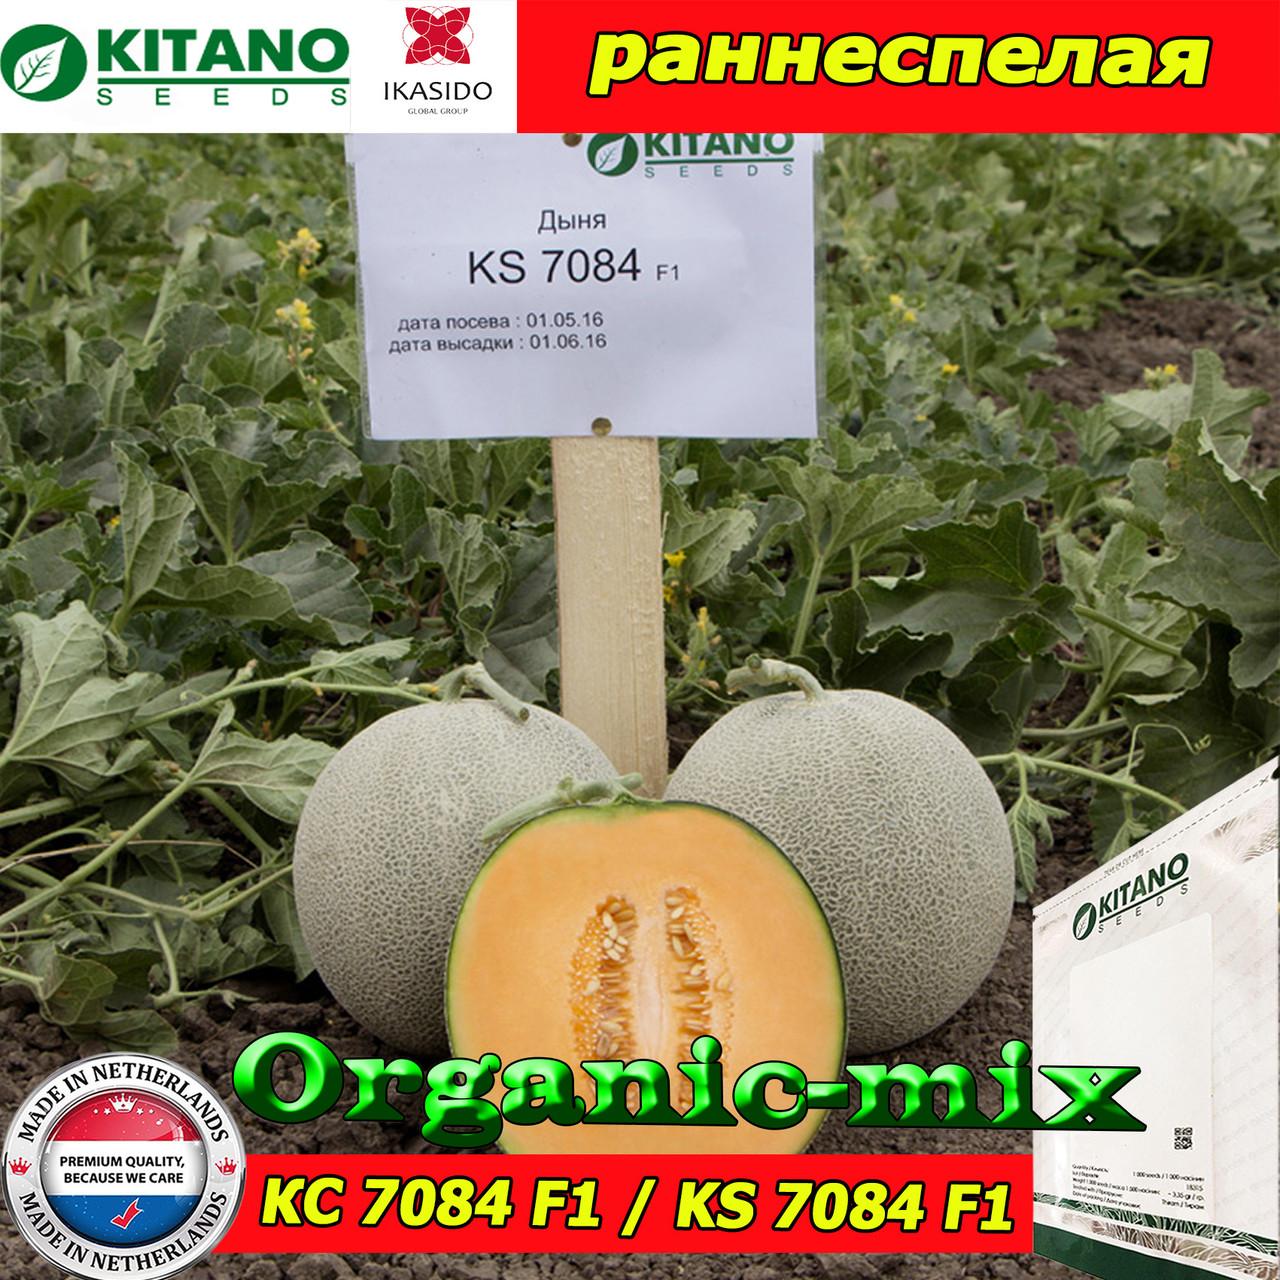 Семена, дыня КС 7084 F1 / KS 7084 (раннеспелая), 1000 семян ТМ Kitano Seeds (Нидерланды)